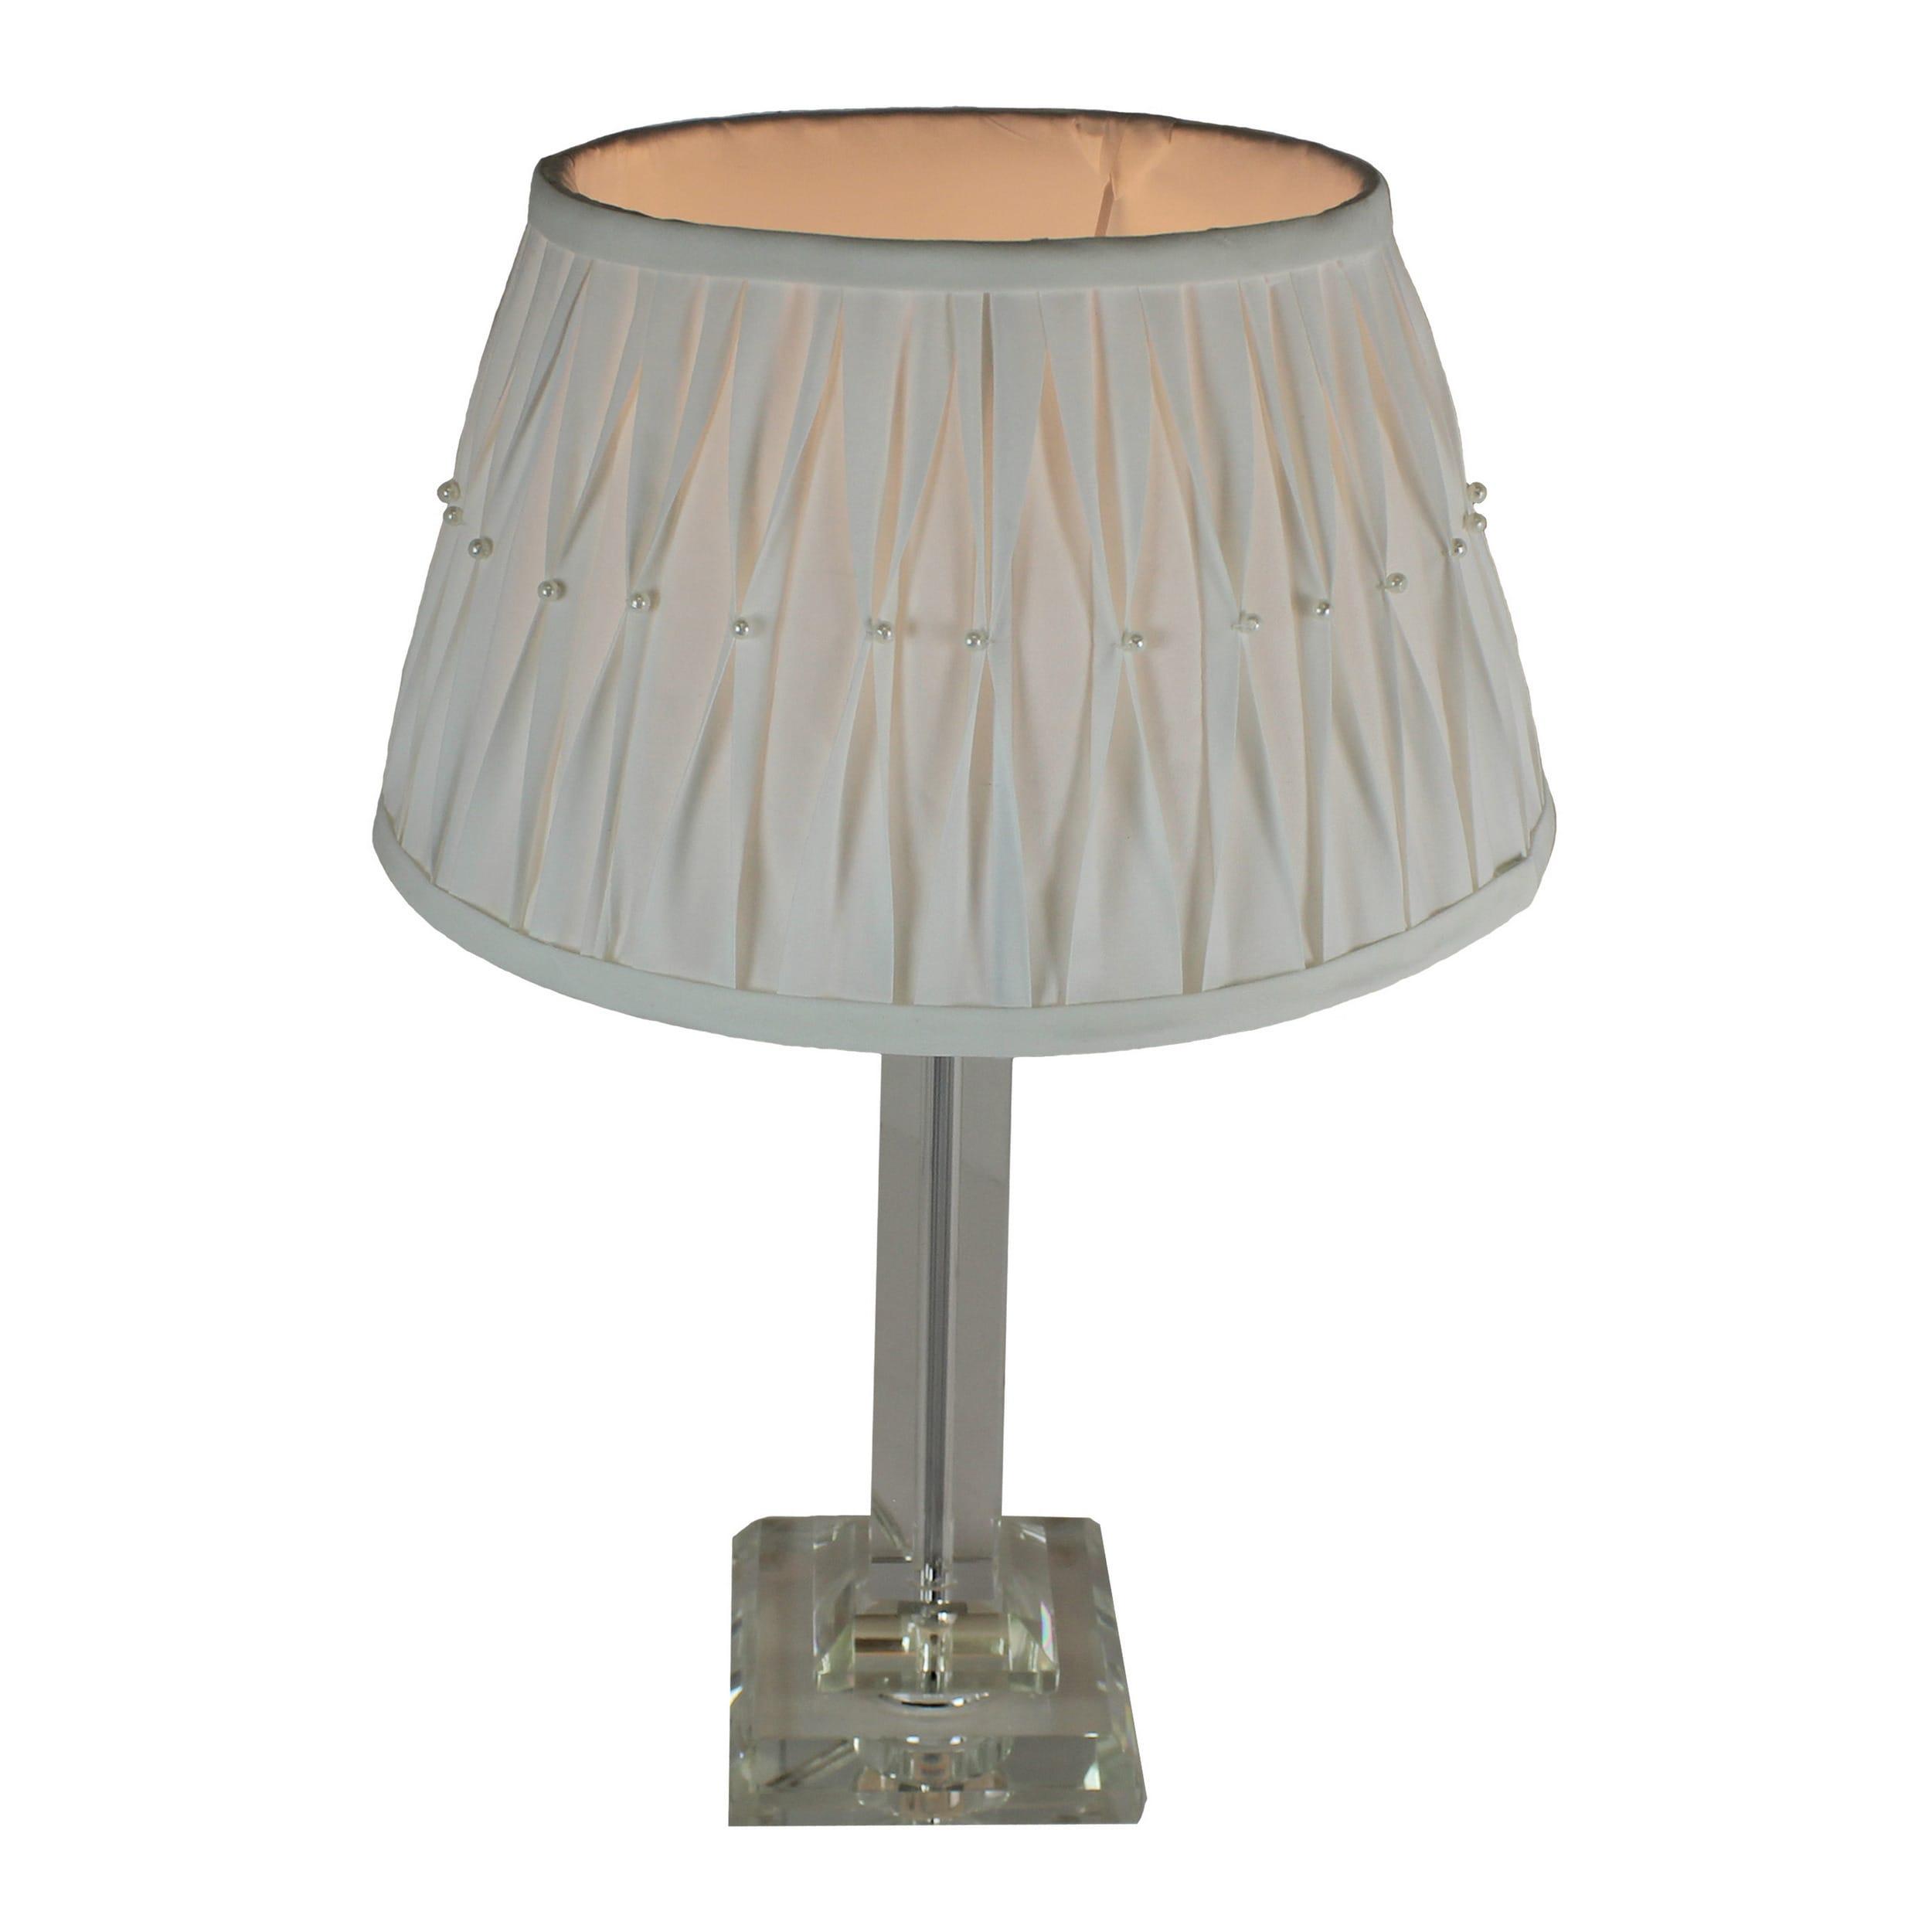 Urban designs 18 inch modern crystal column table lamp free urban designs 18 inch modern crystal column table lamp free shipping today overstock 26059896 aloadofball Choice Image